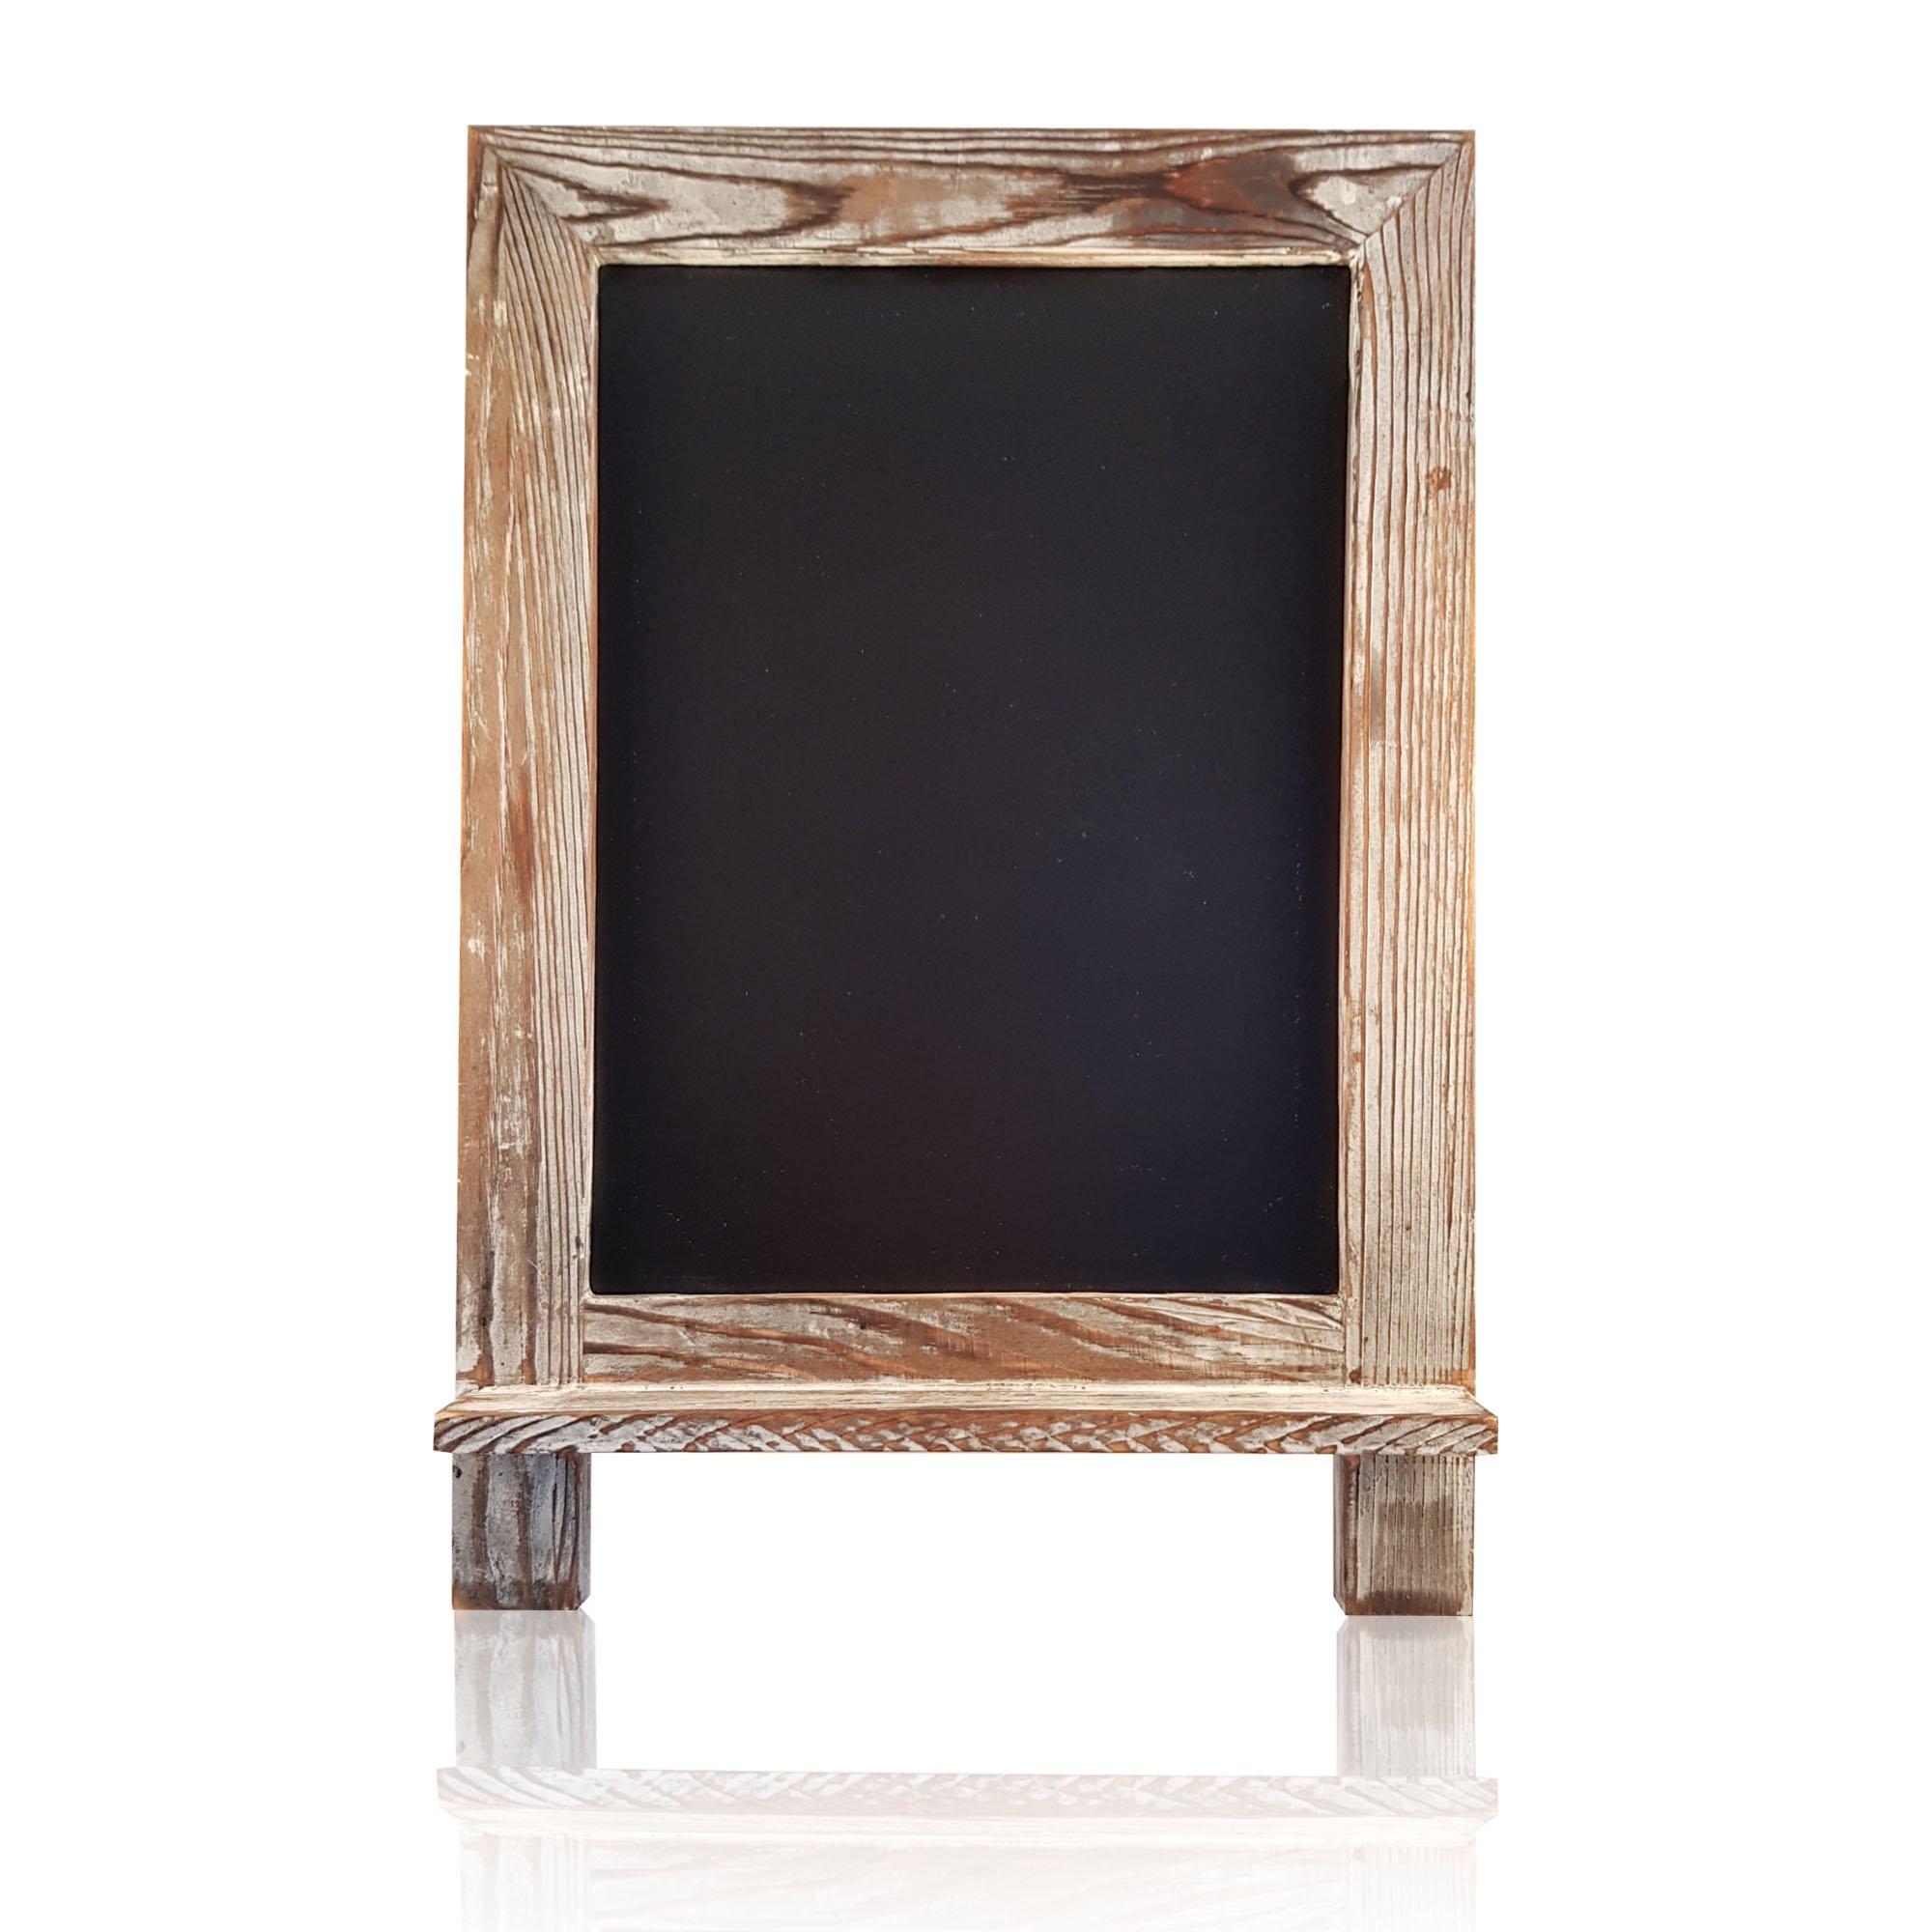 One Happy Home Rustic Chalkboard Whitewashed 14'' x 9.5''